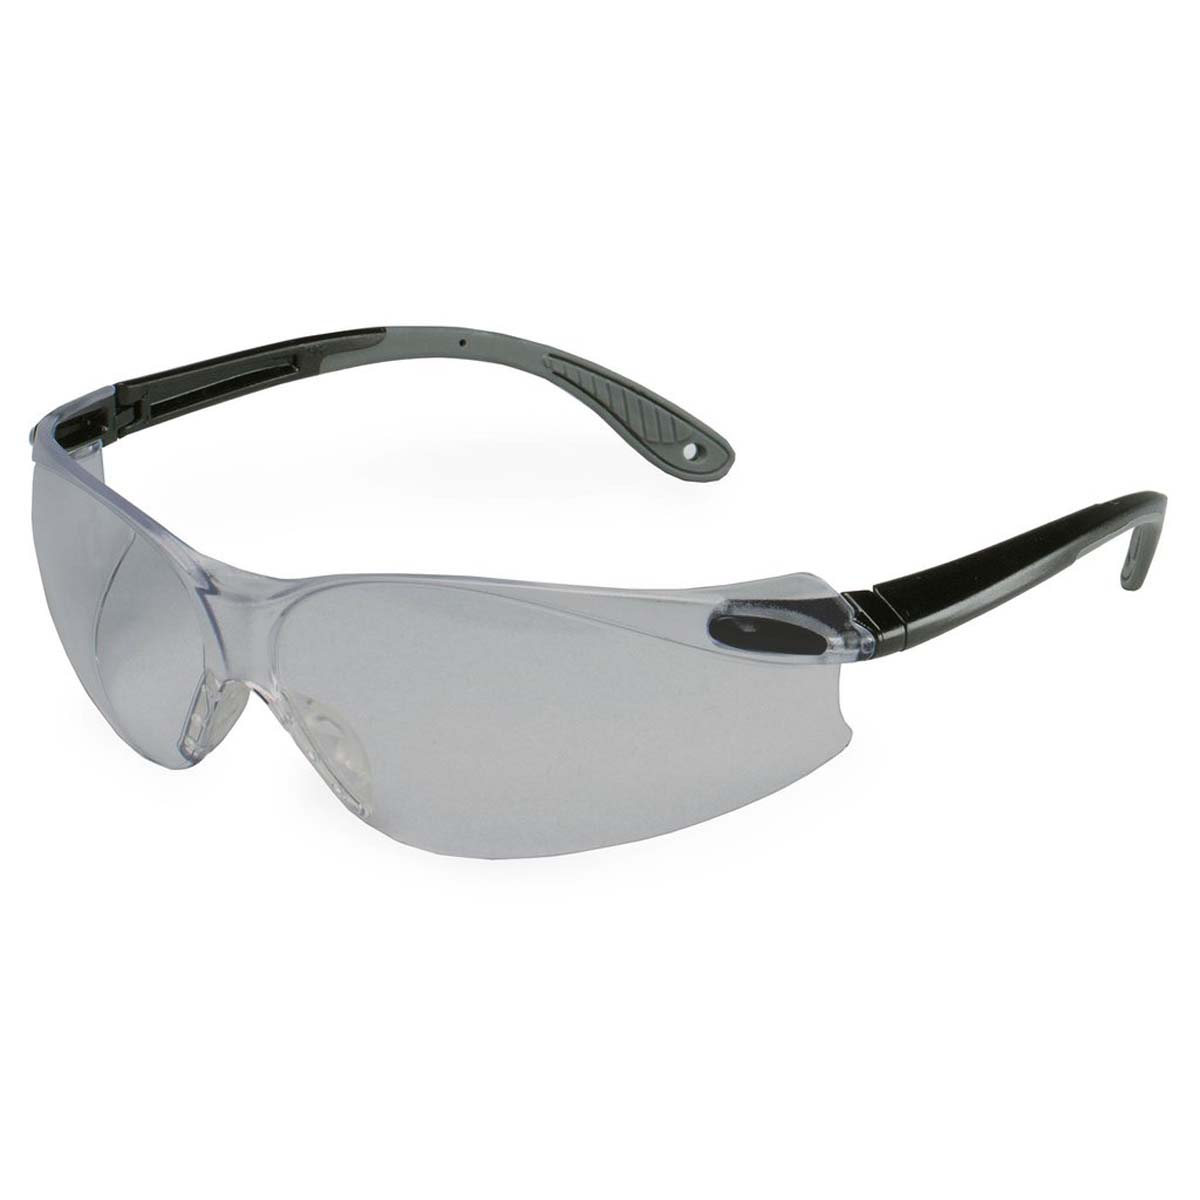 "3Mâ""¢ Virtuaâ""¢ V4 Protective Eyewear 11673-00000-20 Gray Anti-Fog Lens, Black/Gray Temple"